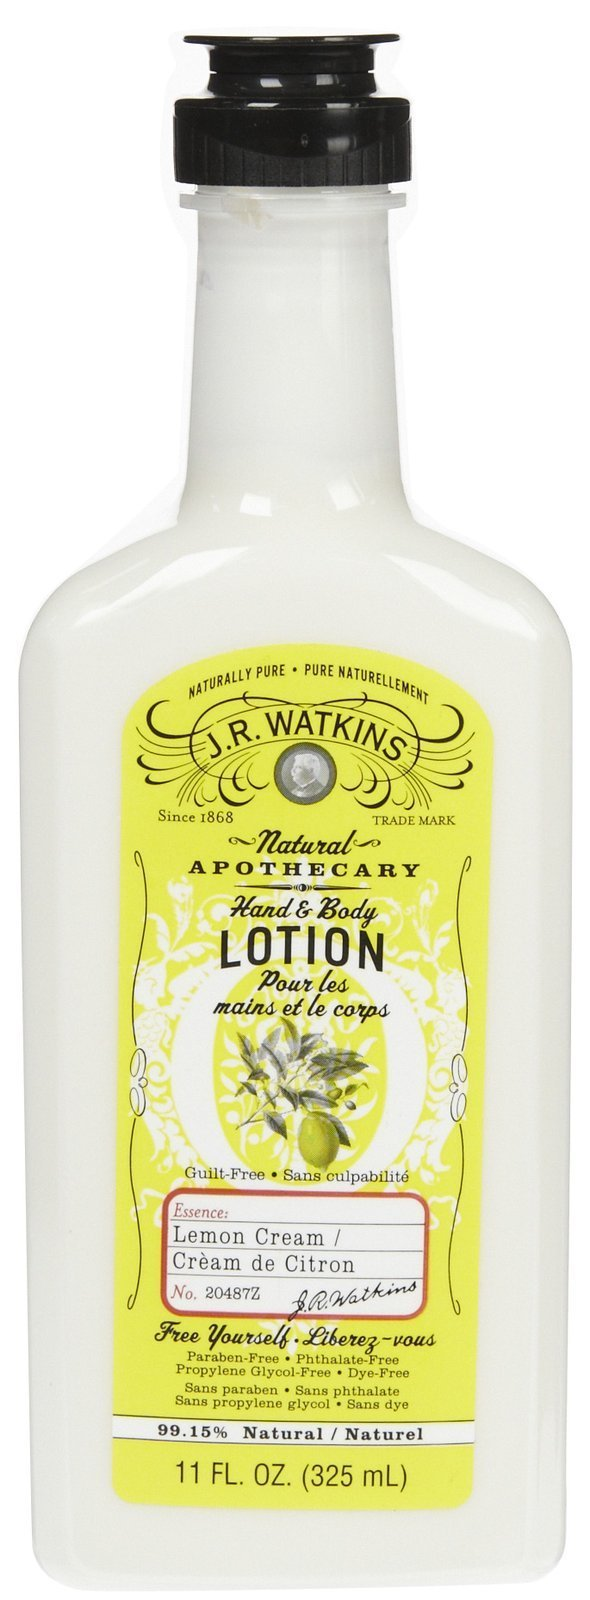 Pokupki/customer/account/login - J R Watkins Naturals Apothecary Hand Body Lotion Lemon Cream 11 Oz